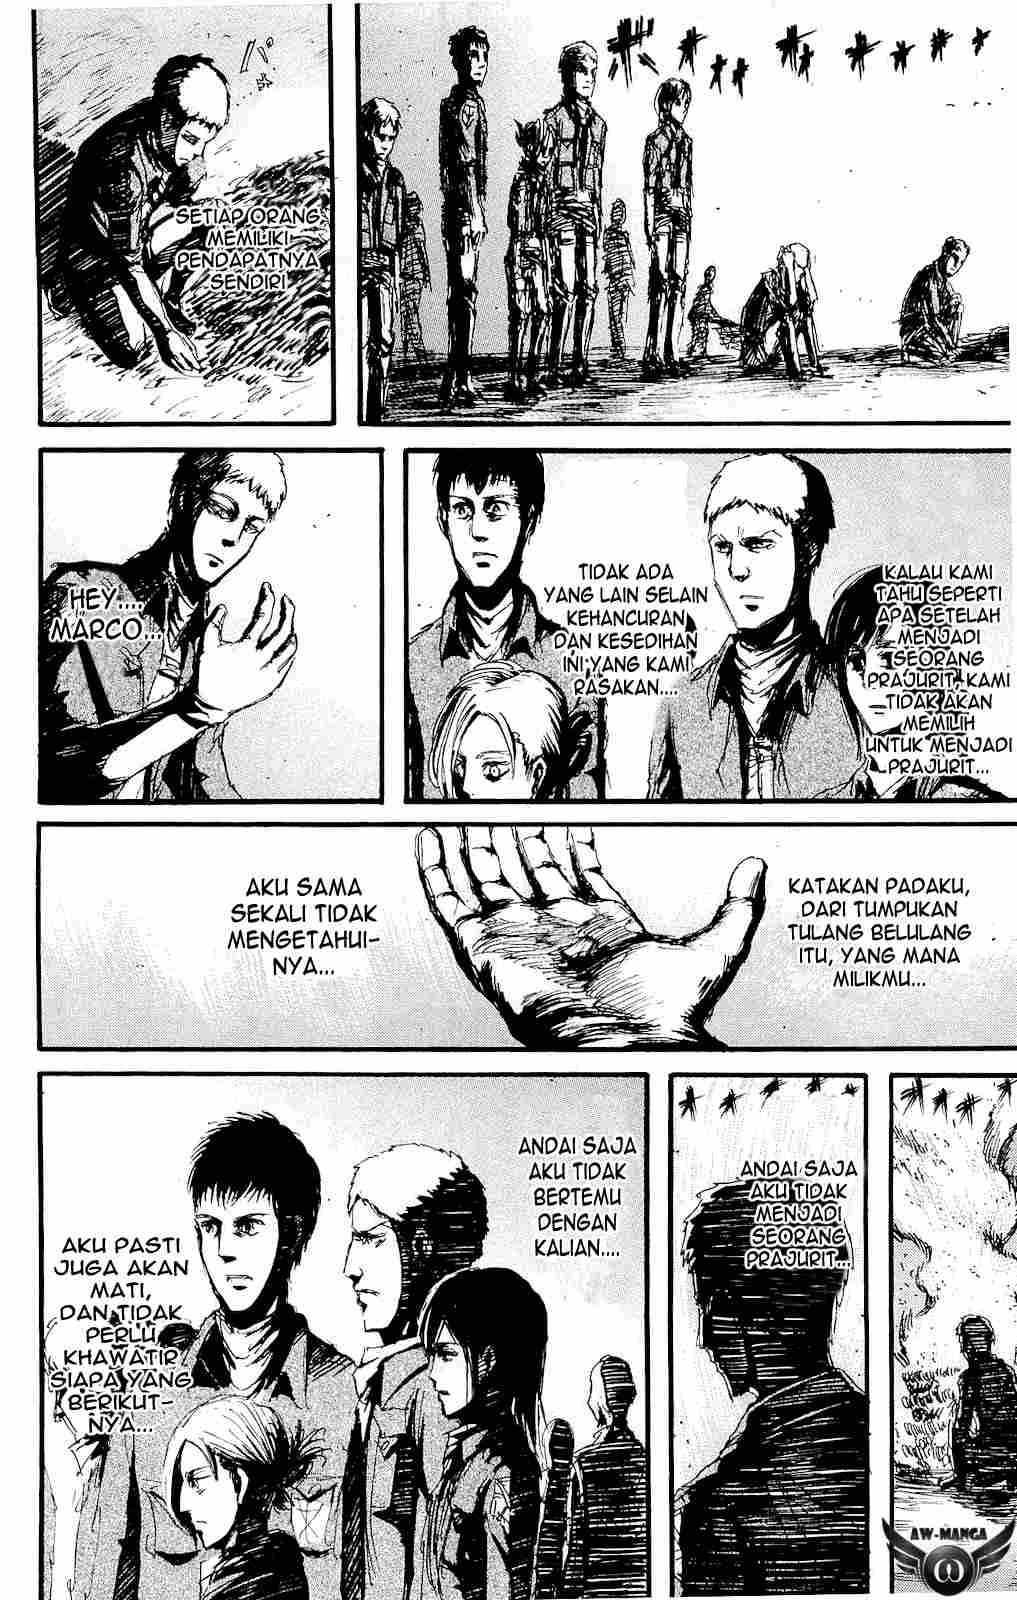 Komik shingeki no kyojin 018 - sekarang apa yang harus dilakukan 19 Indonesia shingeki no kyojin 018 - sekarang apa yang harus dilakukan Terbaru 27|Baca Manga Komik Indonesia|